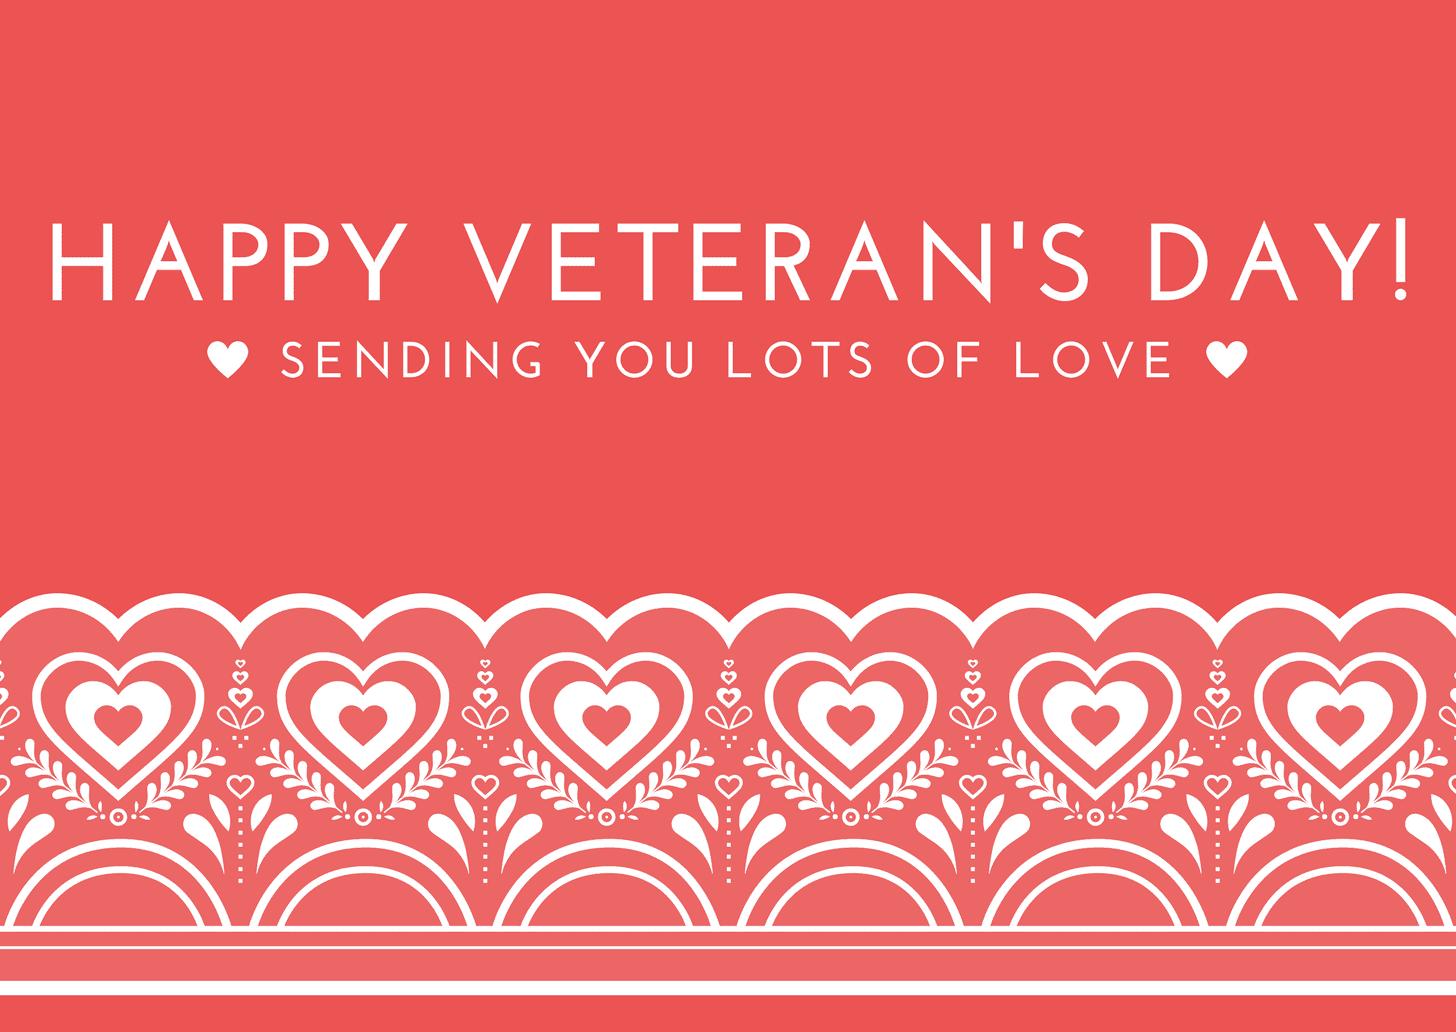 Happy Veteran's Day template